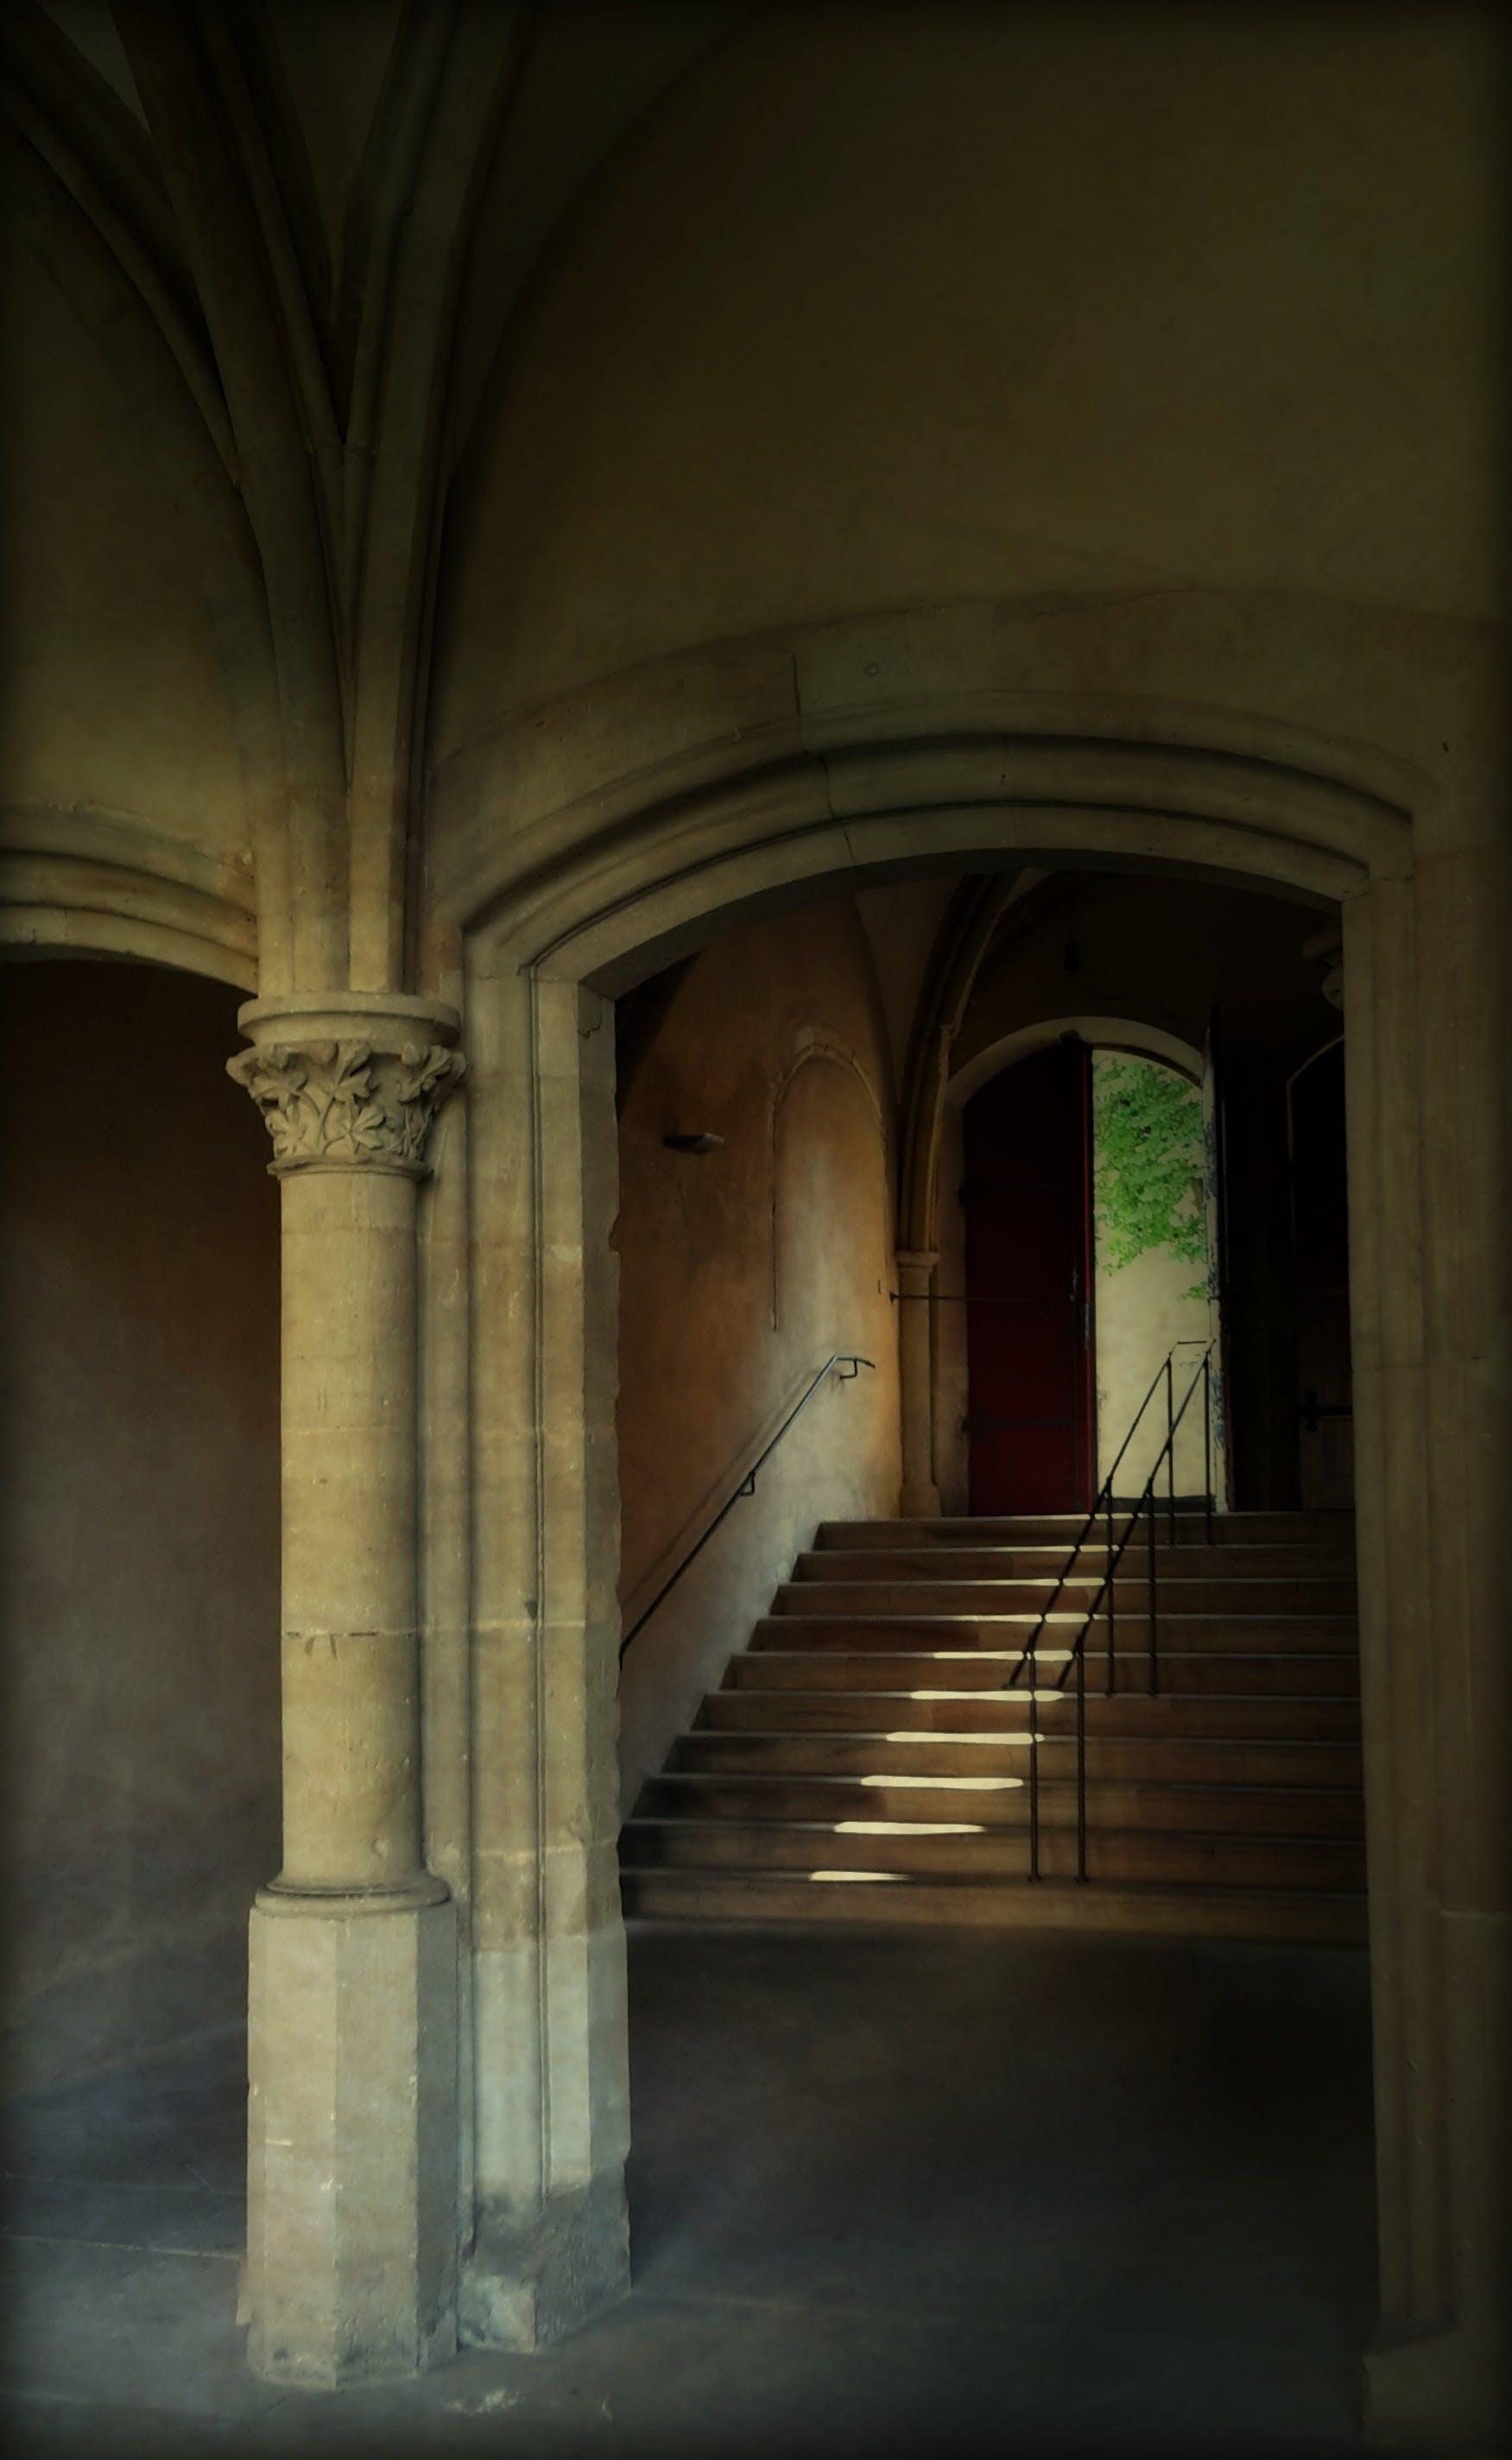 Beige Stone Stairway by Brown Door